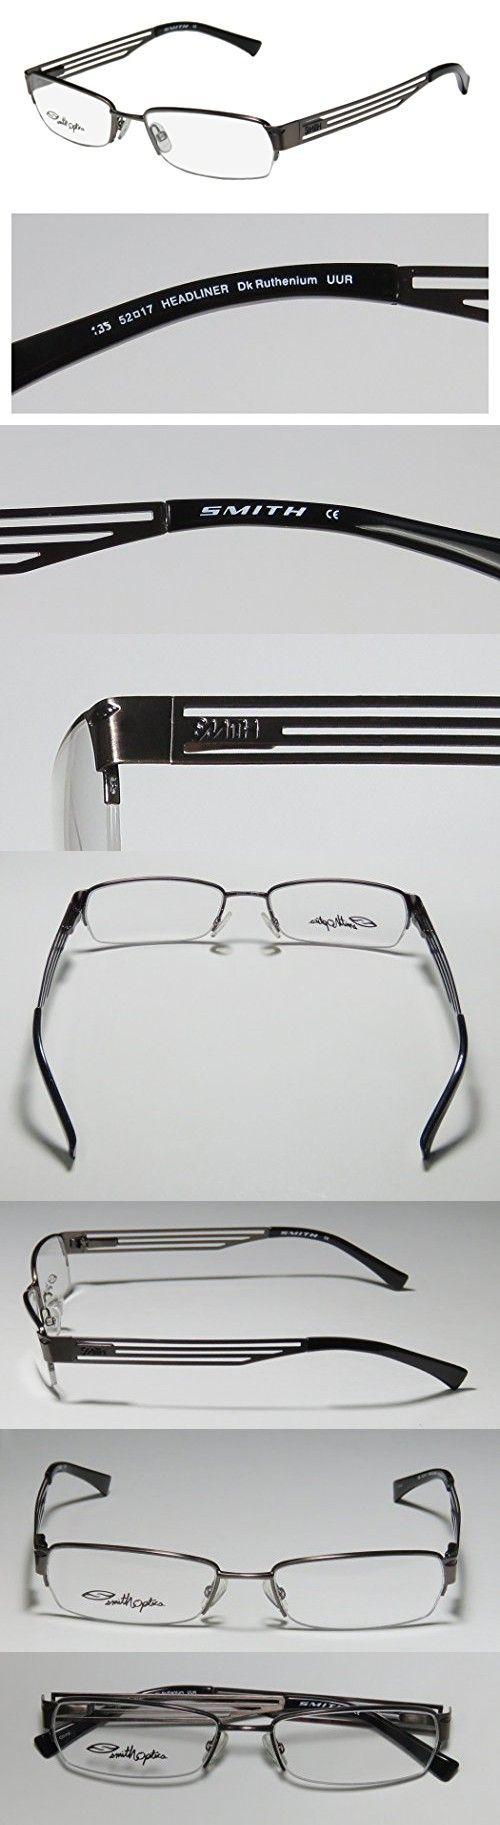 Smith Optics Headliner Eyeglasses UUR - Dark Ruthenium